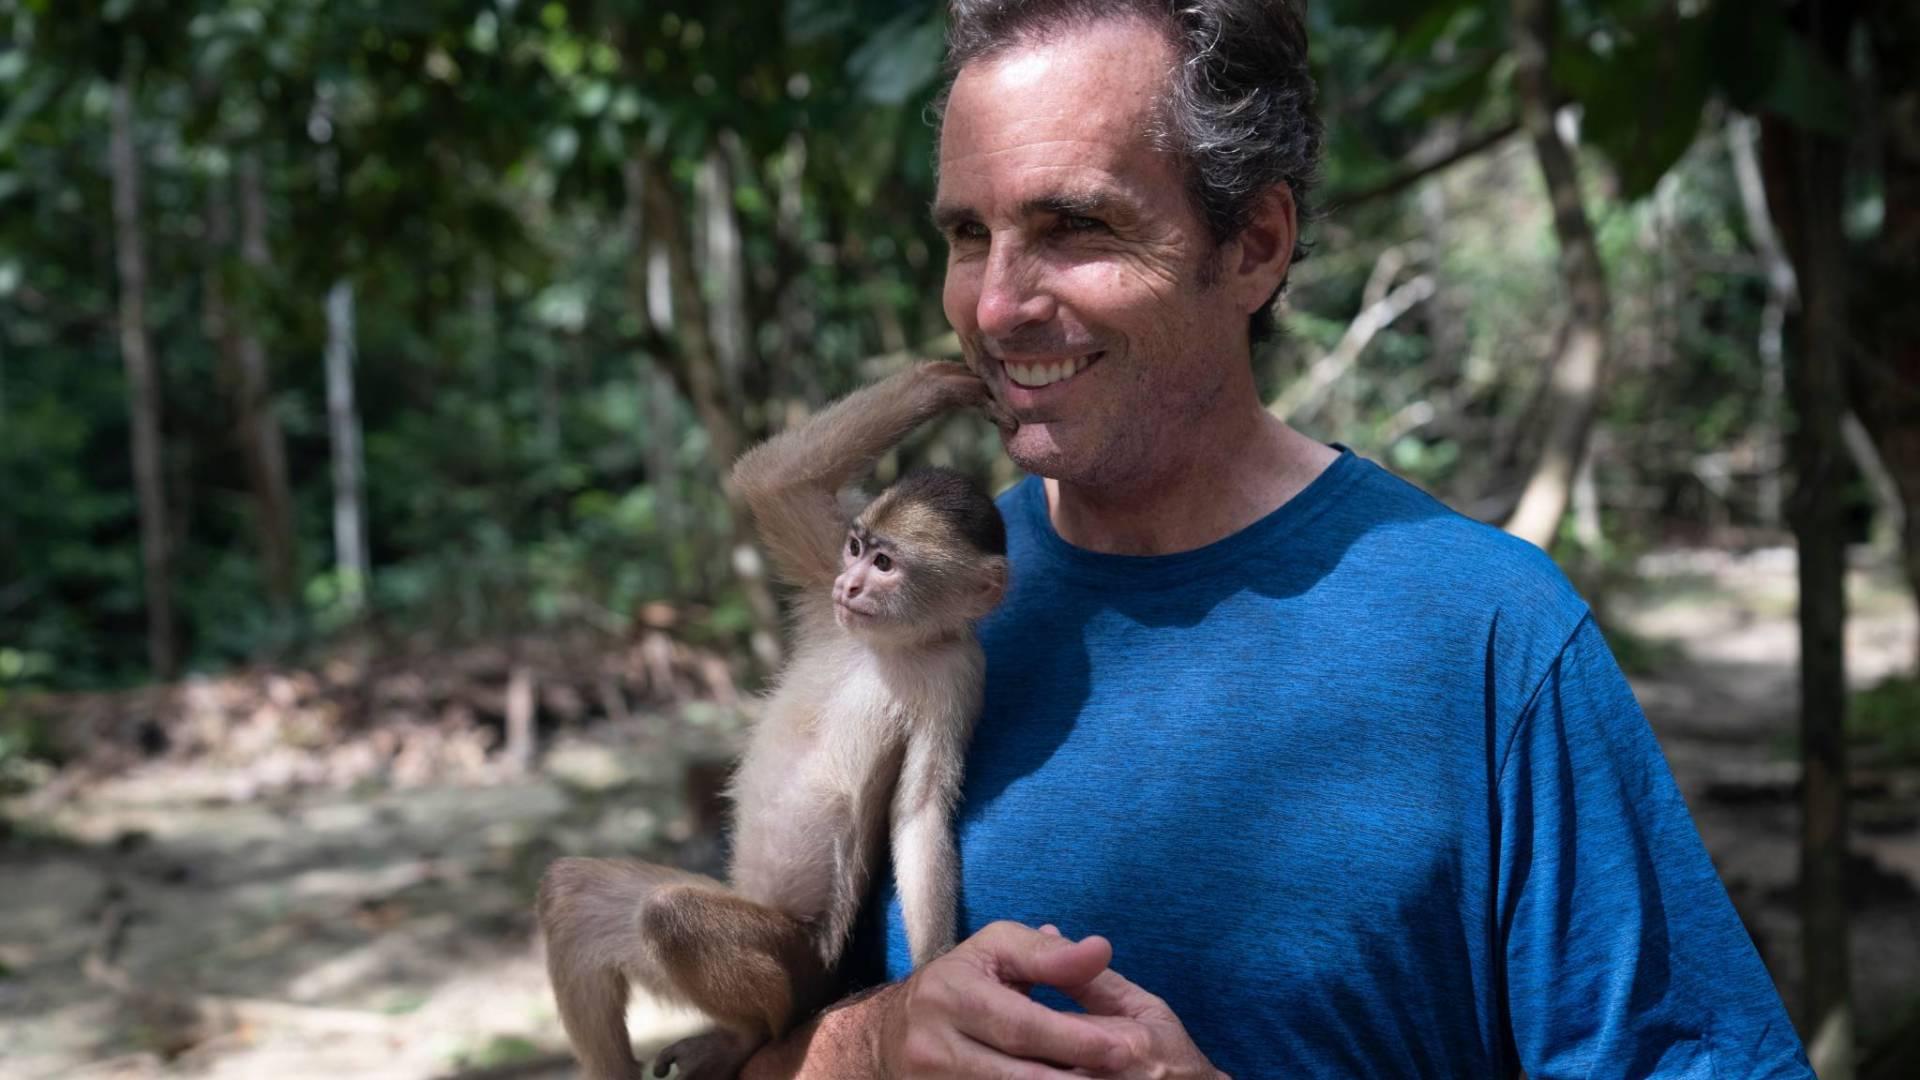 Turisti Curiosi con Bob e Mack Woodruff 10